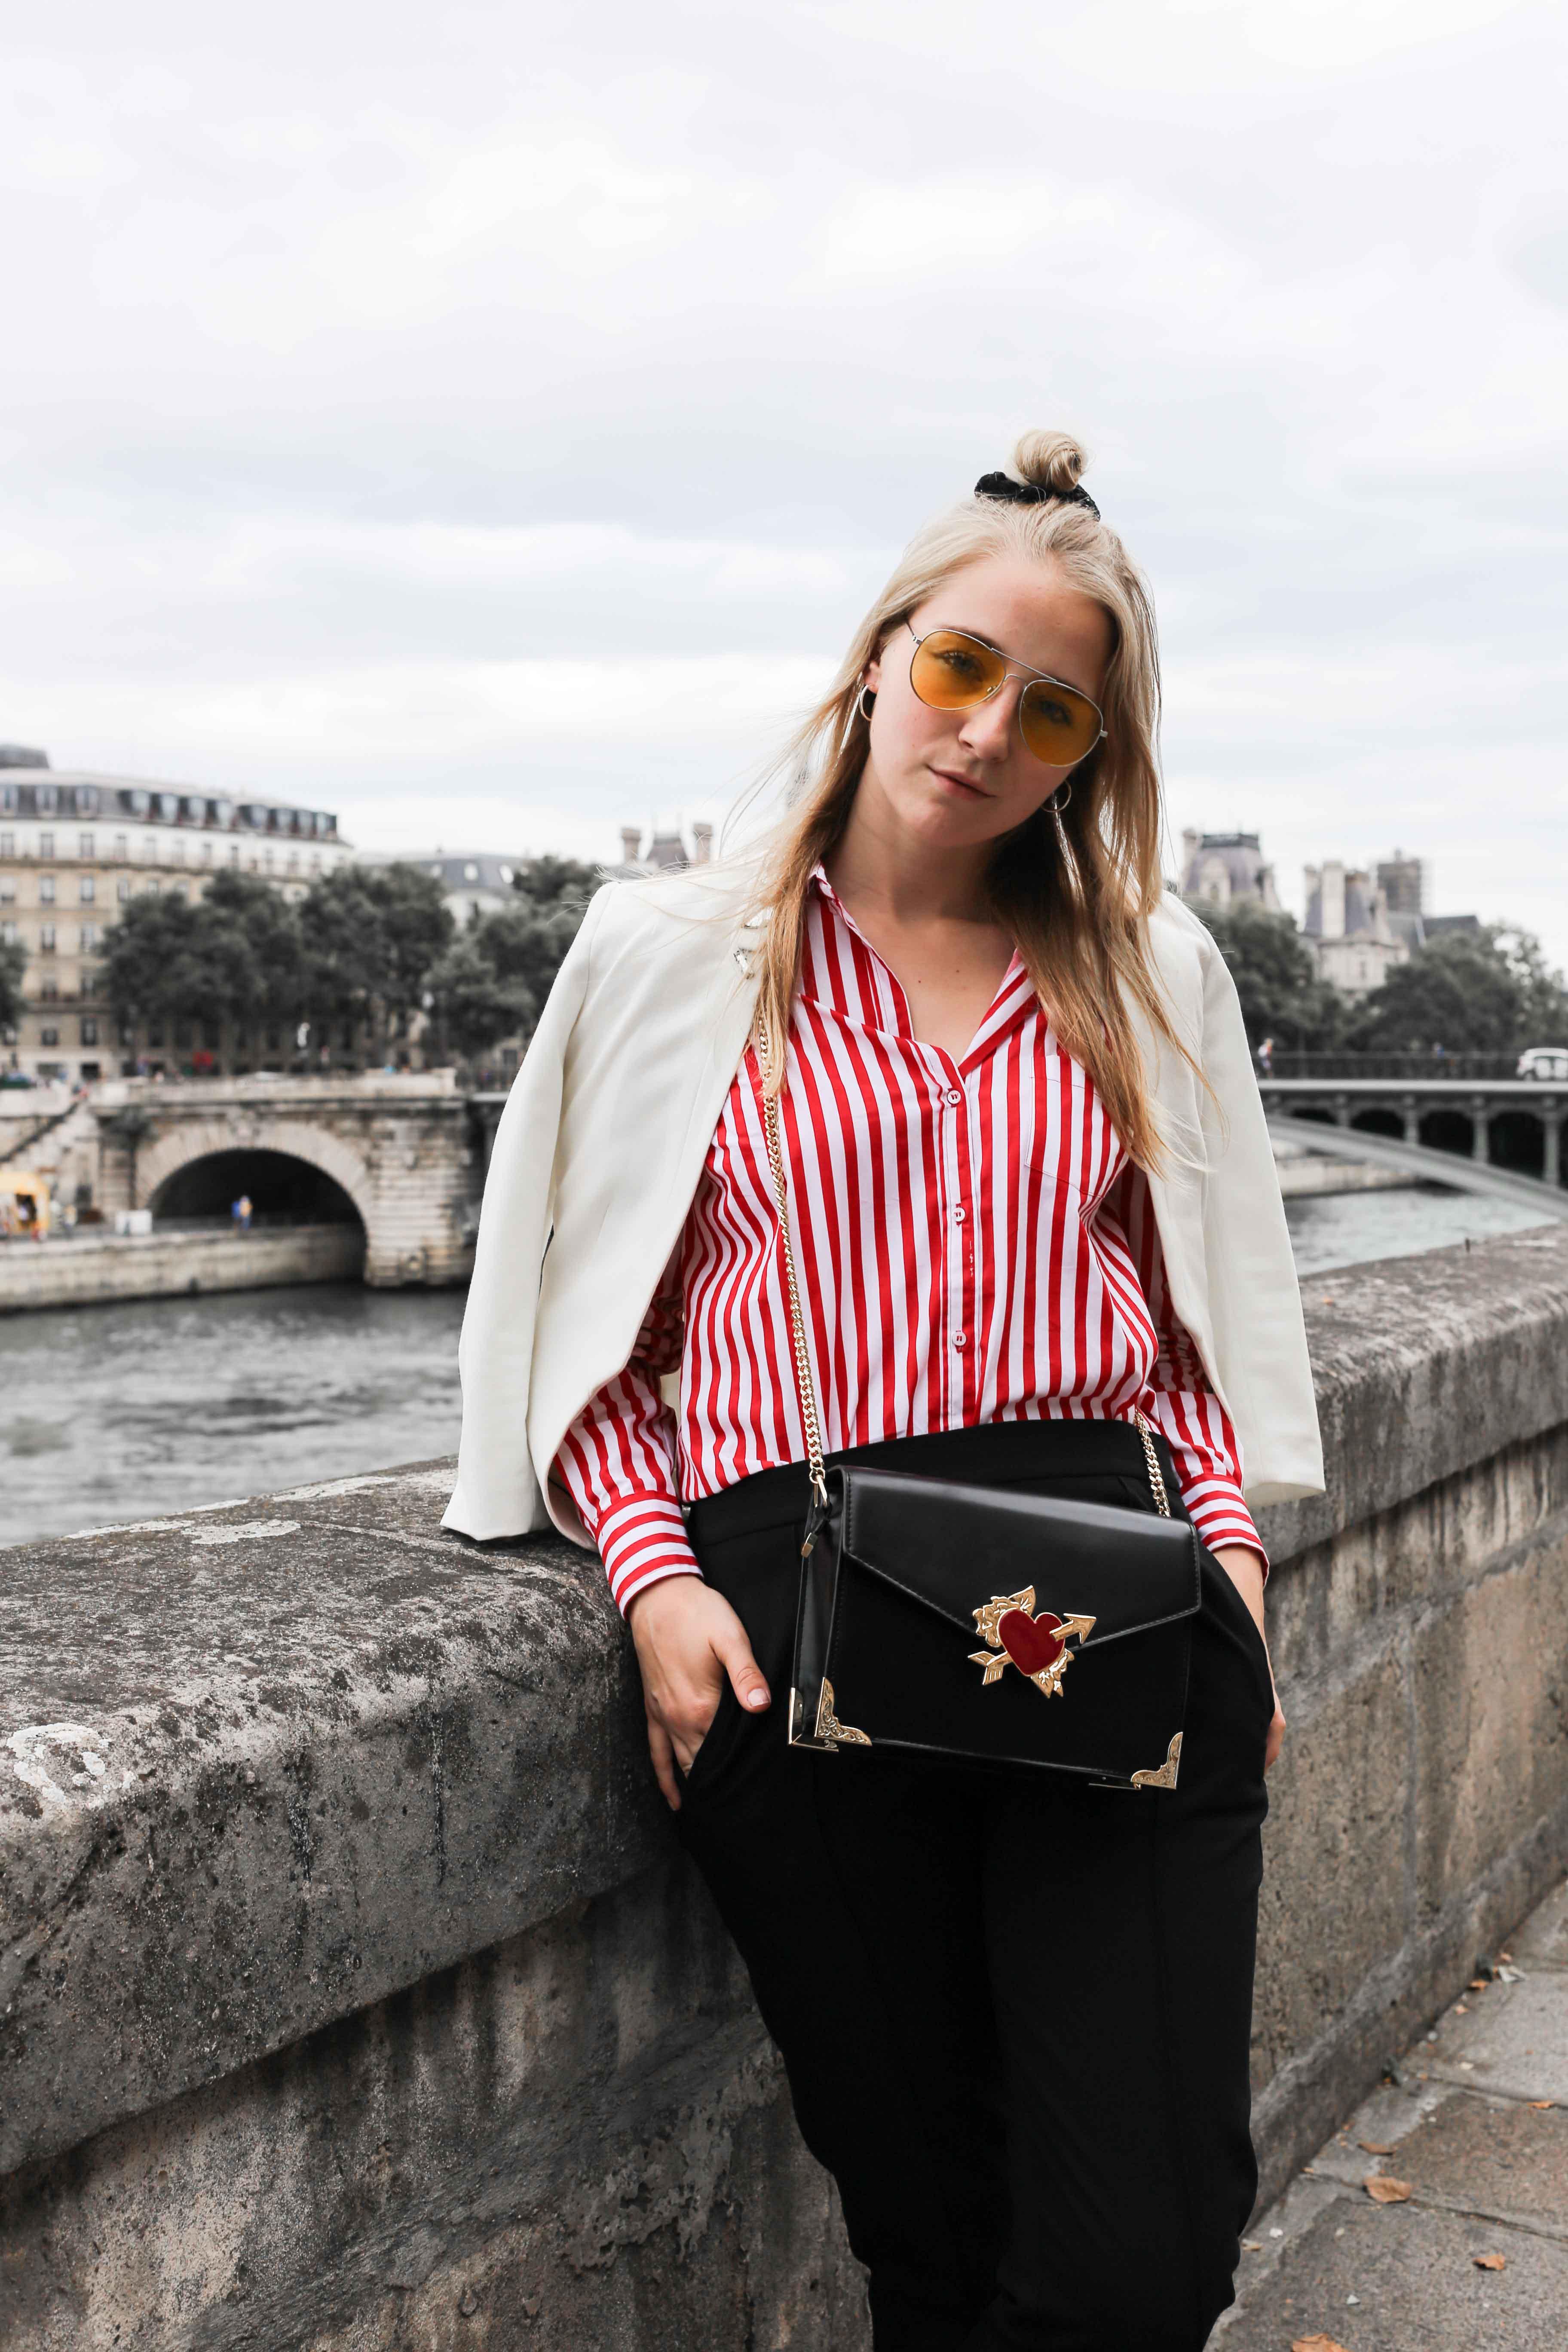 rote-mokassins-streifenbluse-weißer-blazer-paris-modeblog-fashionblog-fashion-blog_1485